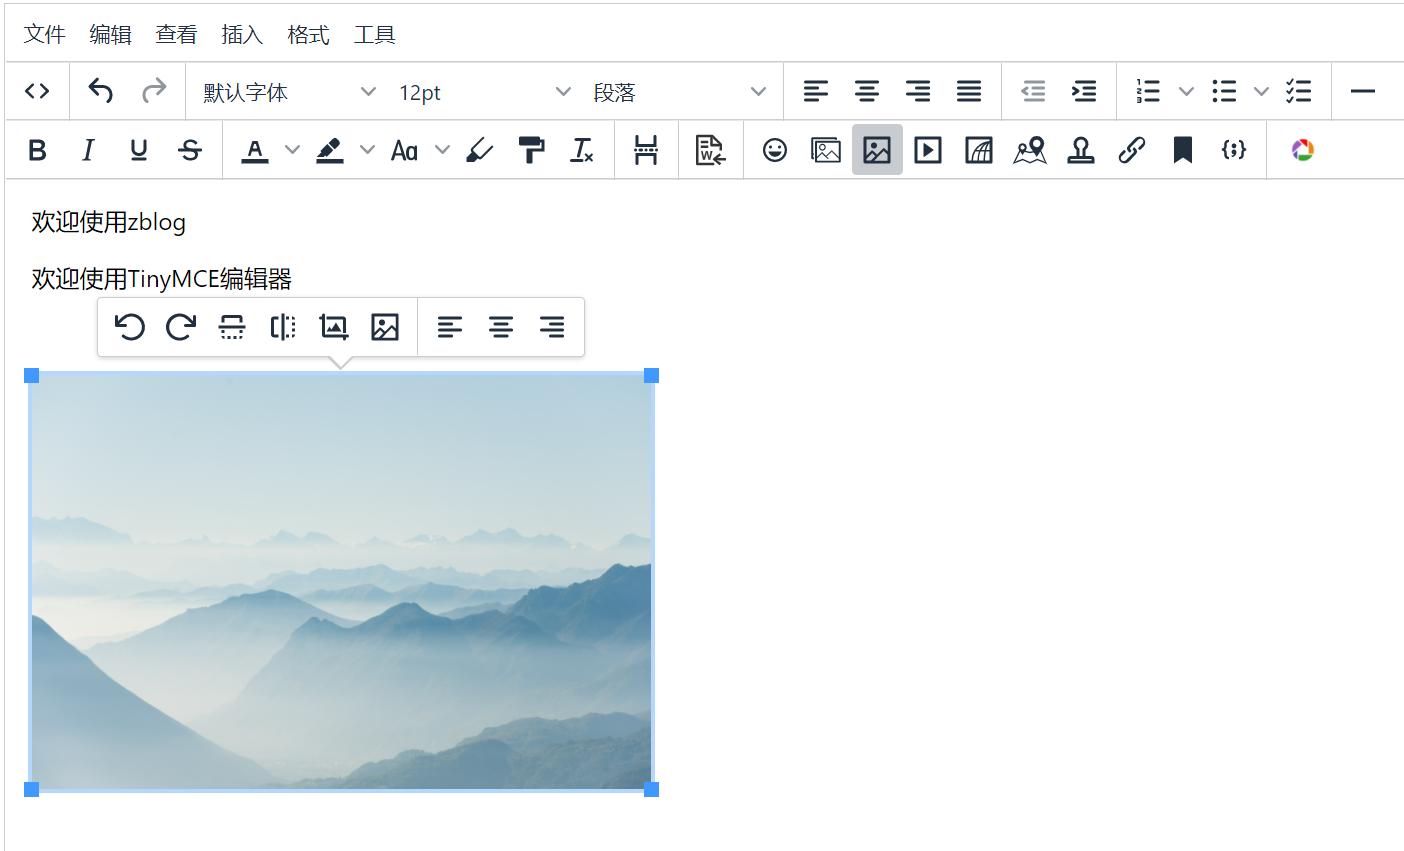 Zblog TinyMCE 富文本编辑器